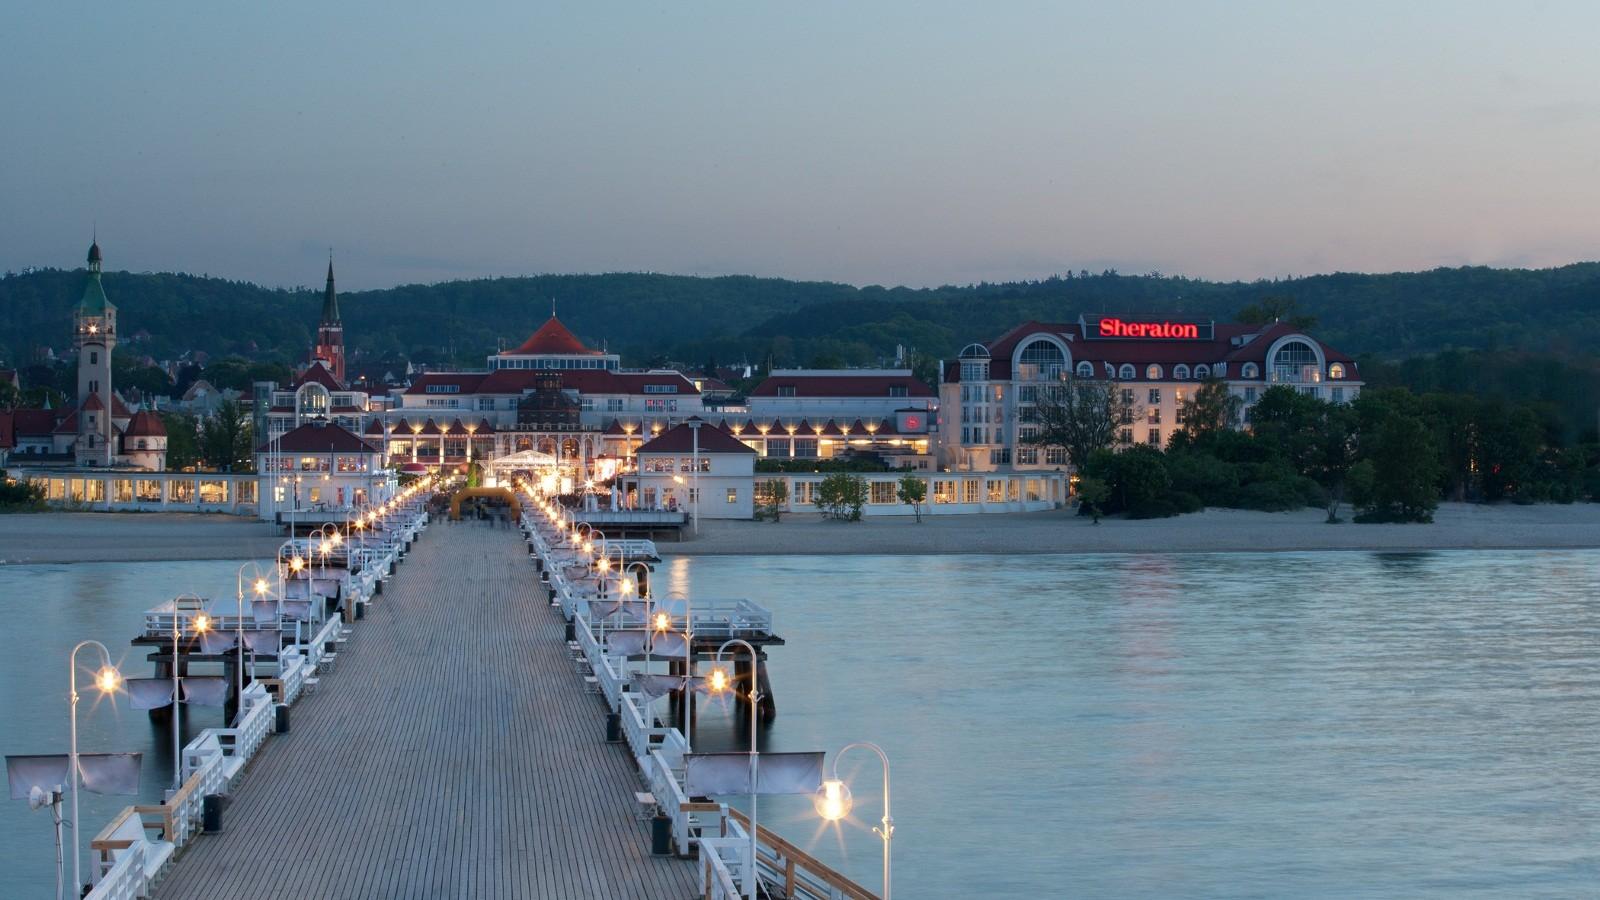 General 1600x900 Sopot Poland Polish pier town resort lights